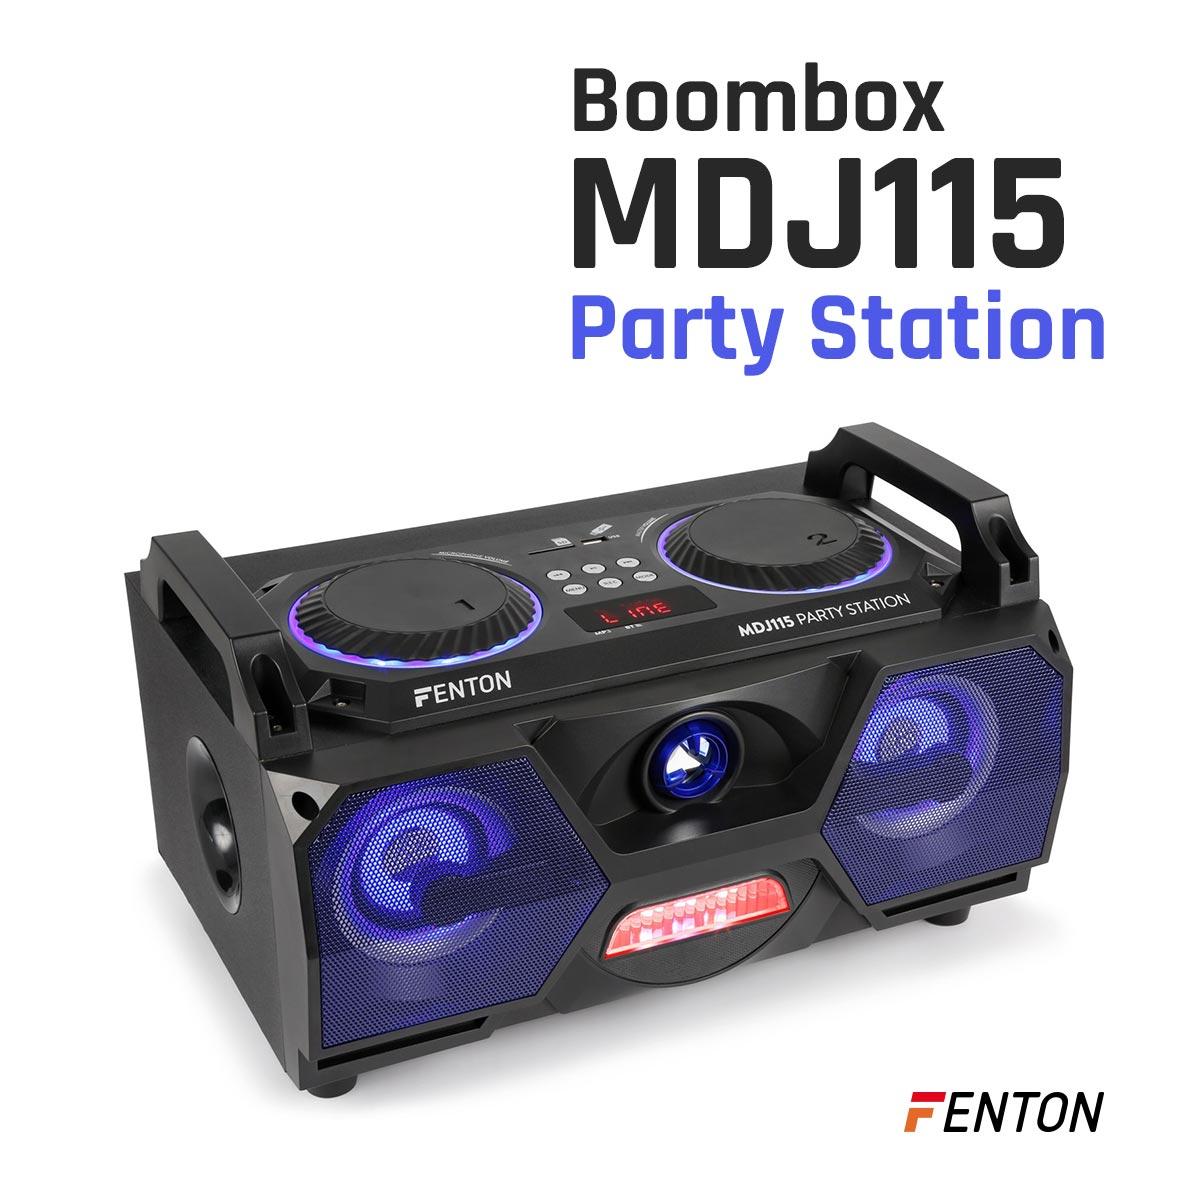 Boombox MDJ115